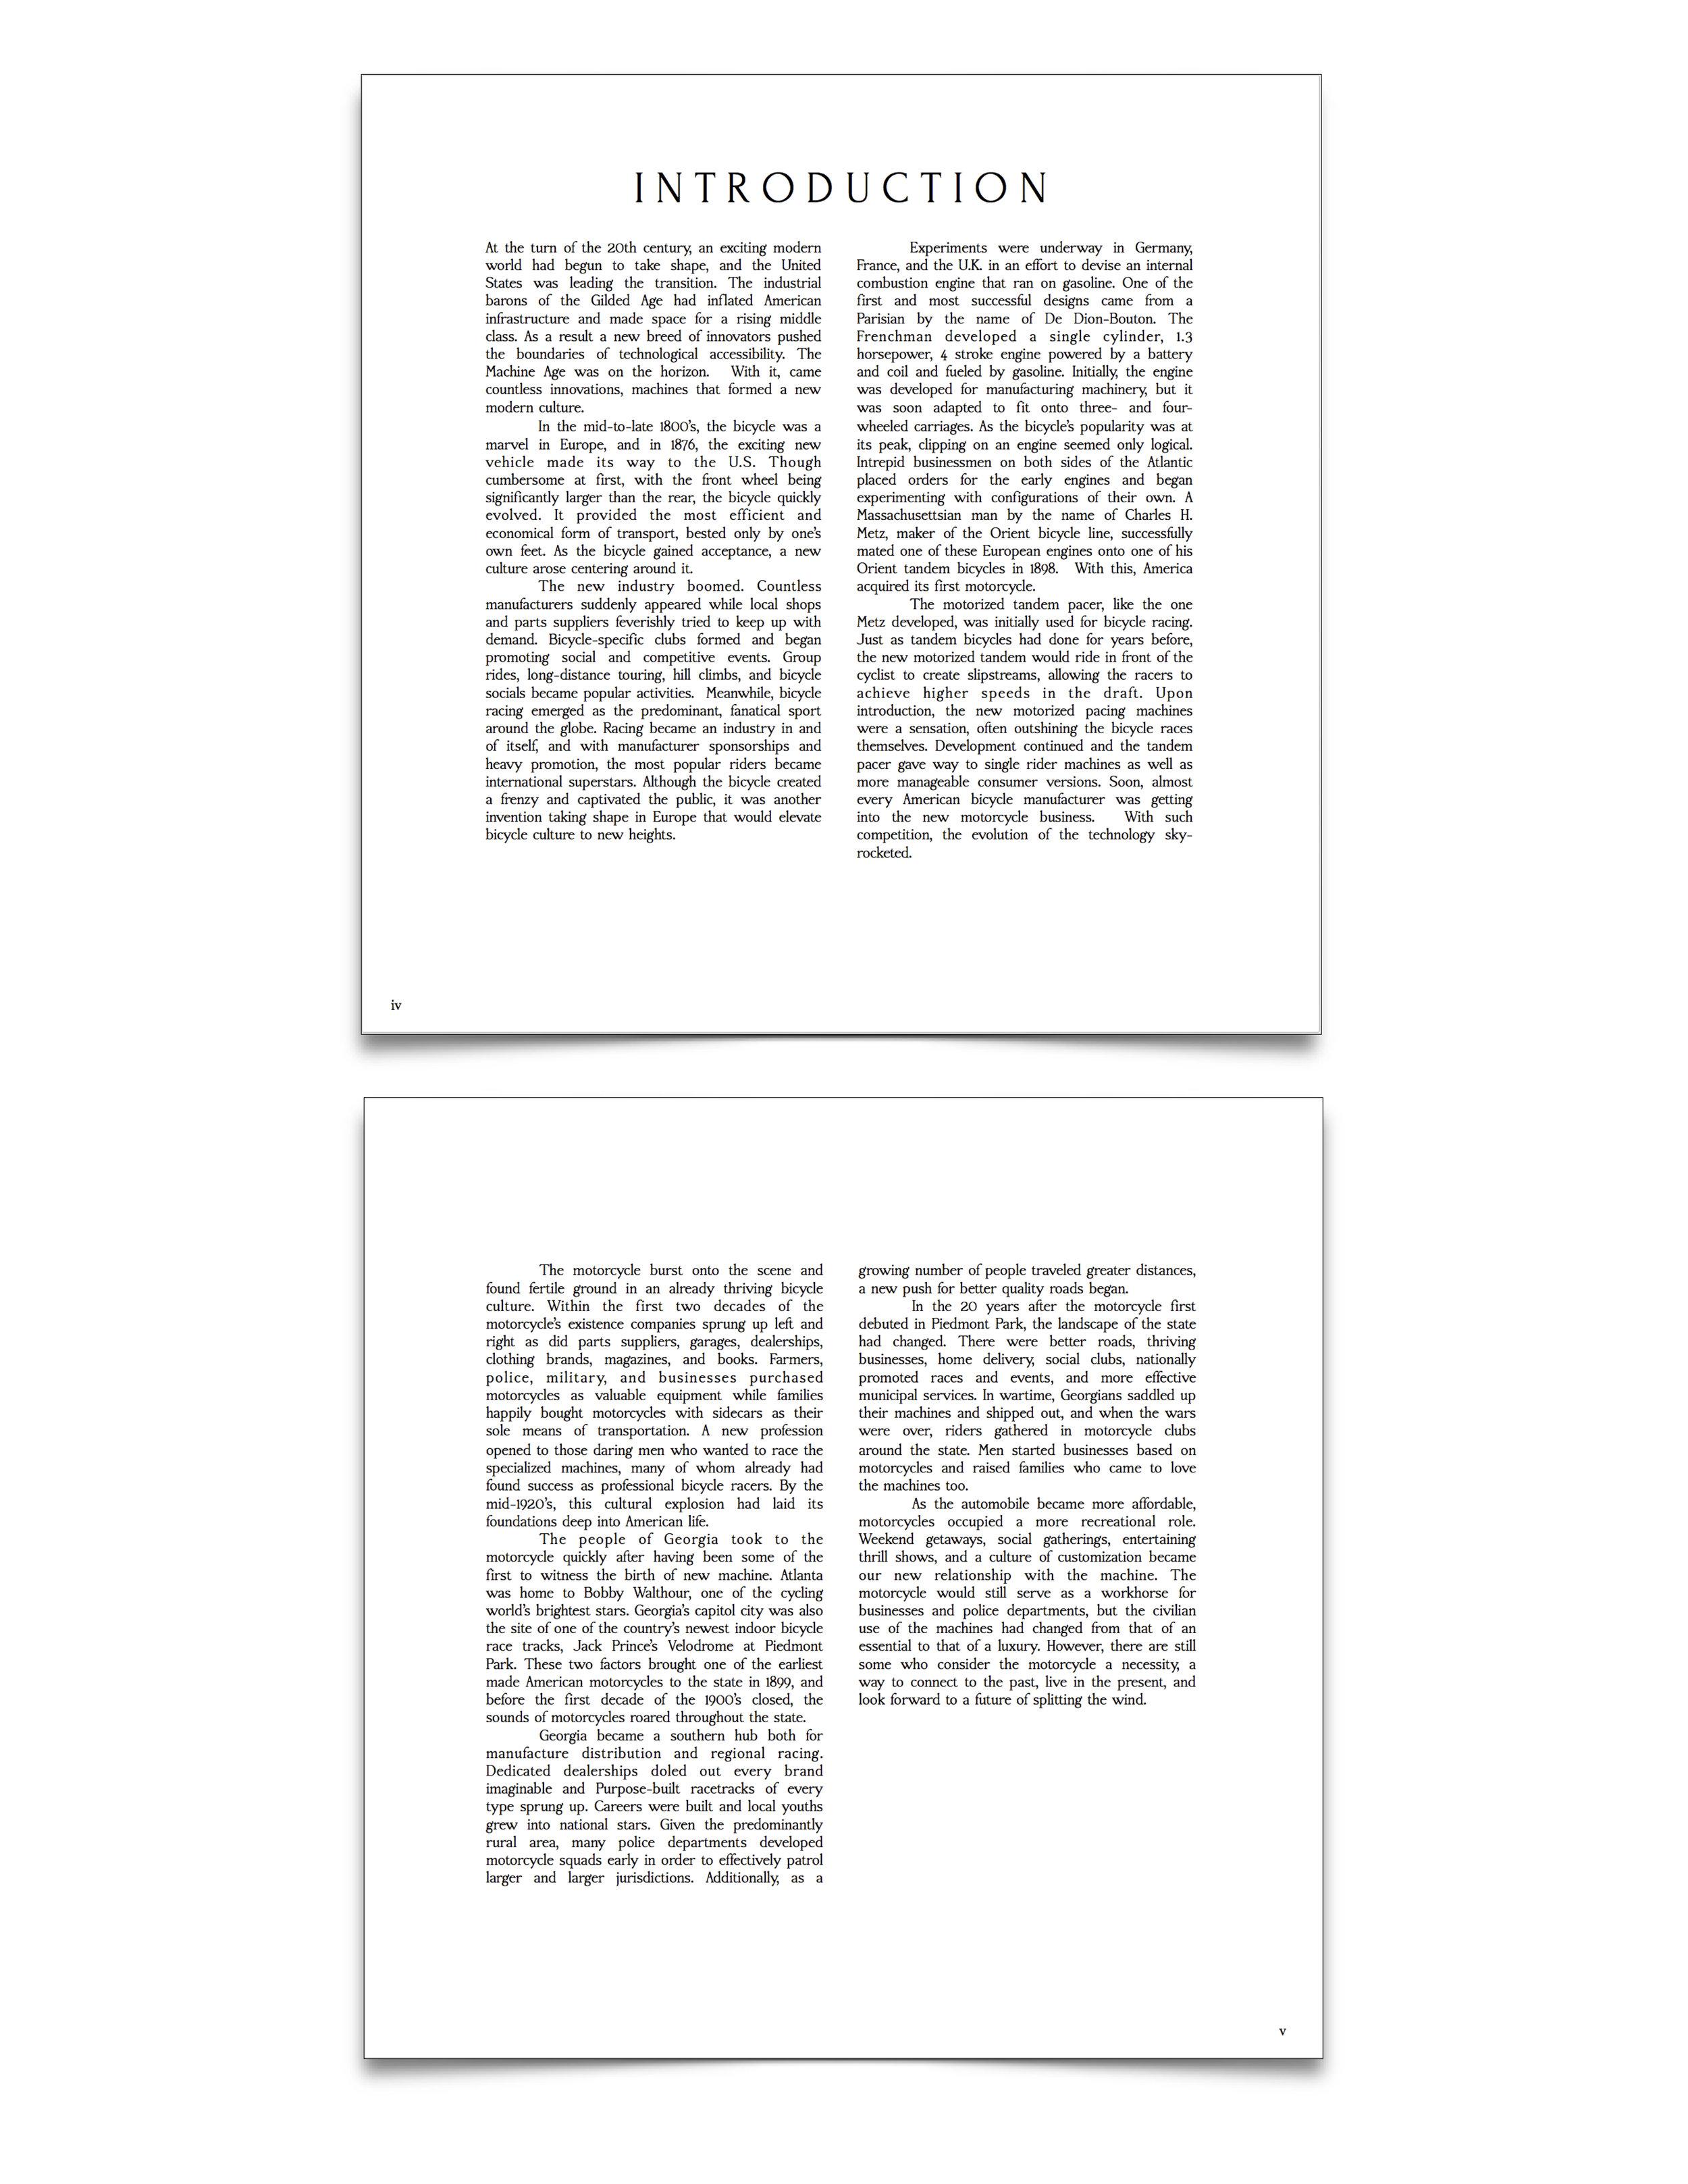 GMH Press Release p4.jpg